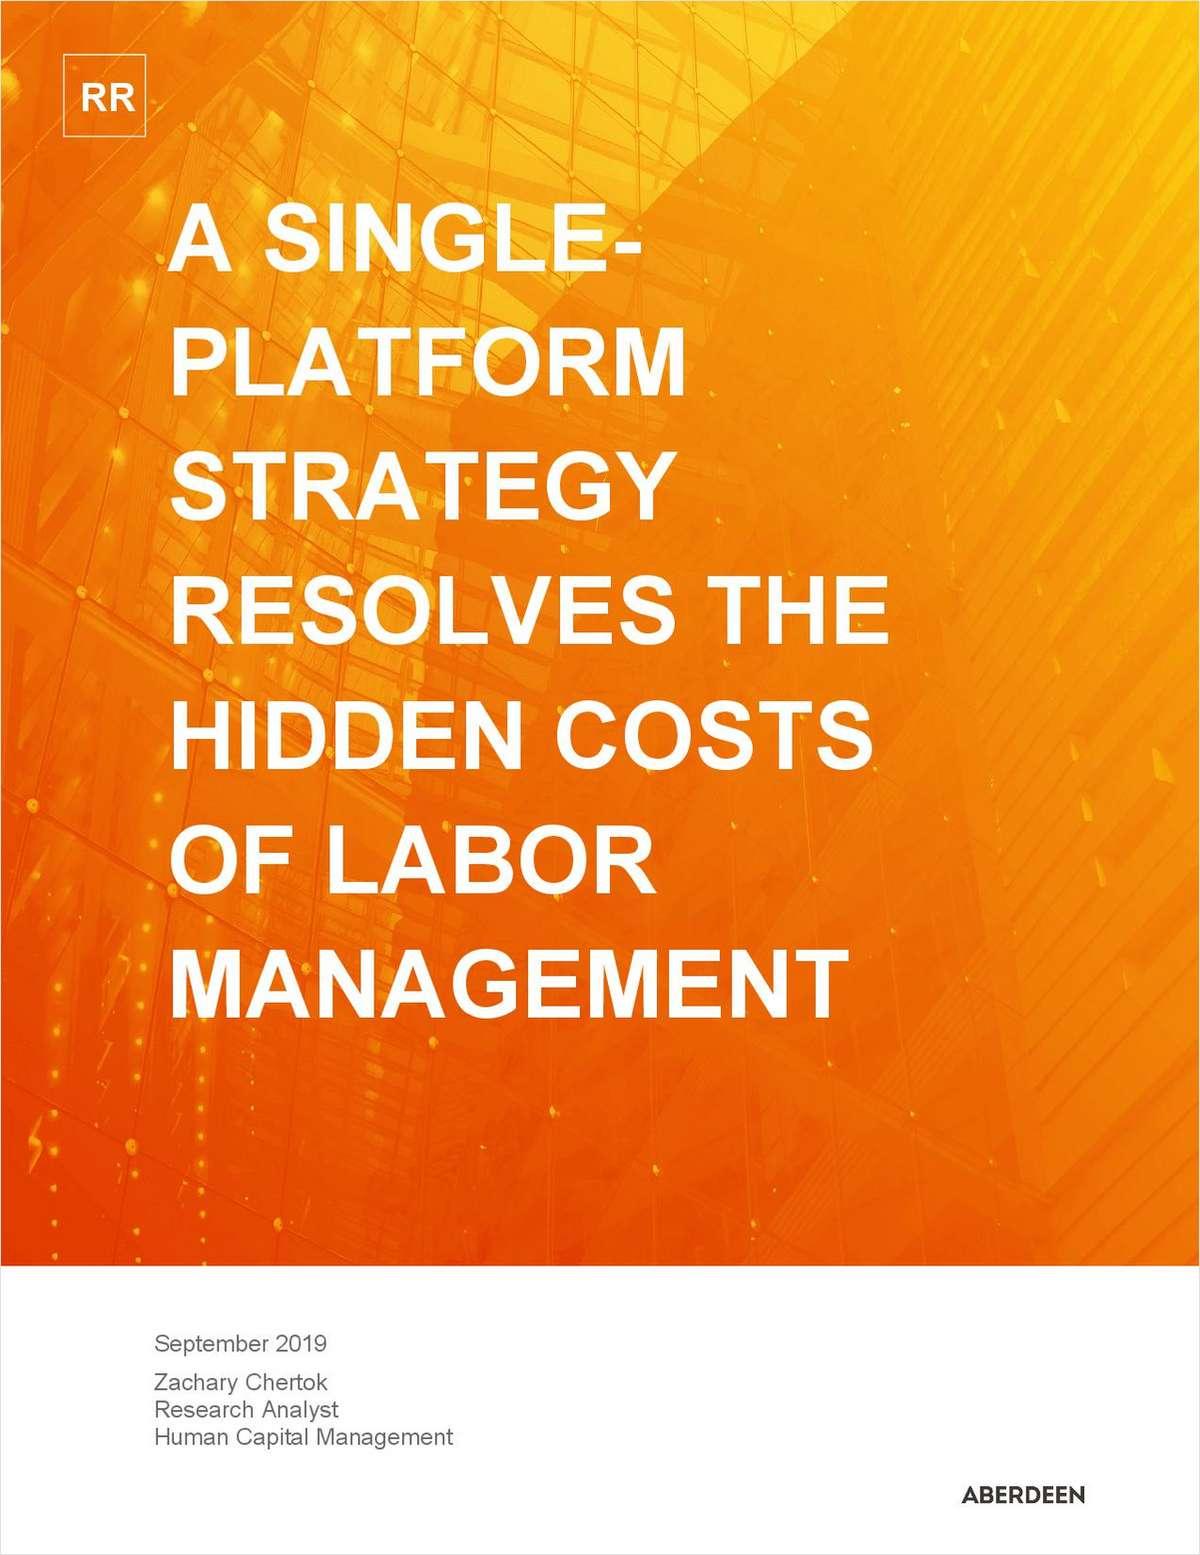 A Single Platform Resolves the Hidden Cost of Workforce Management